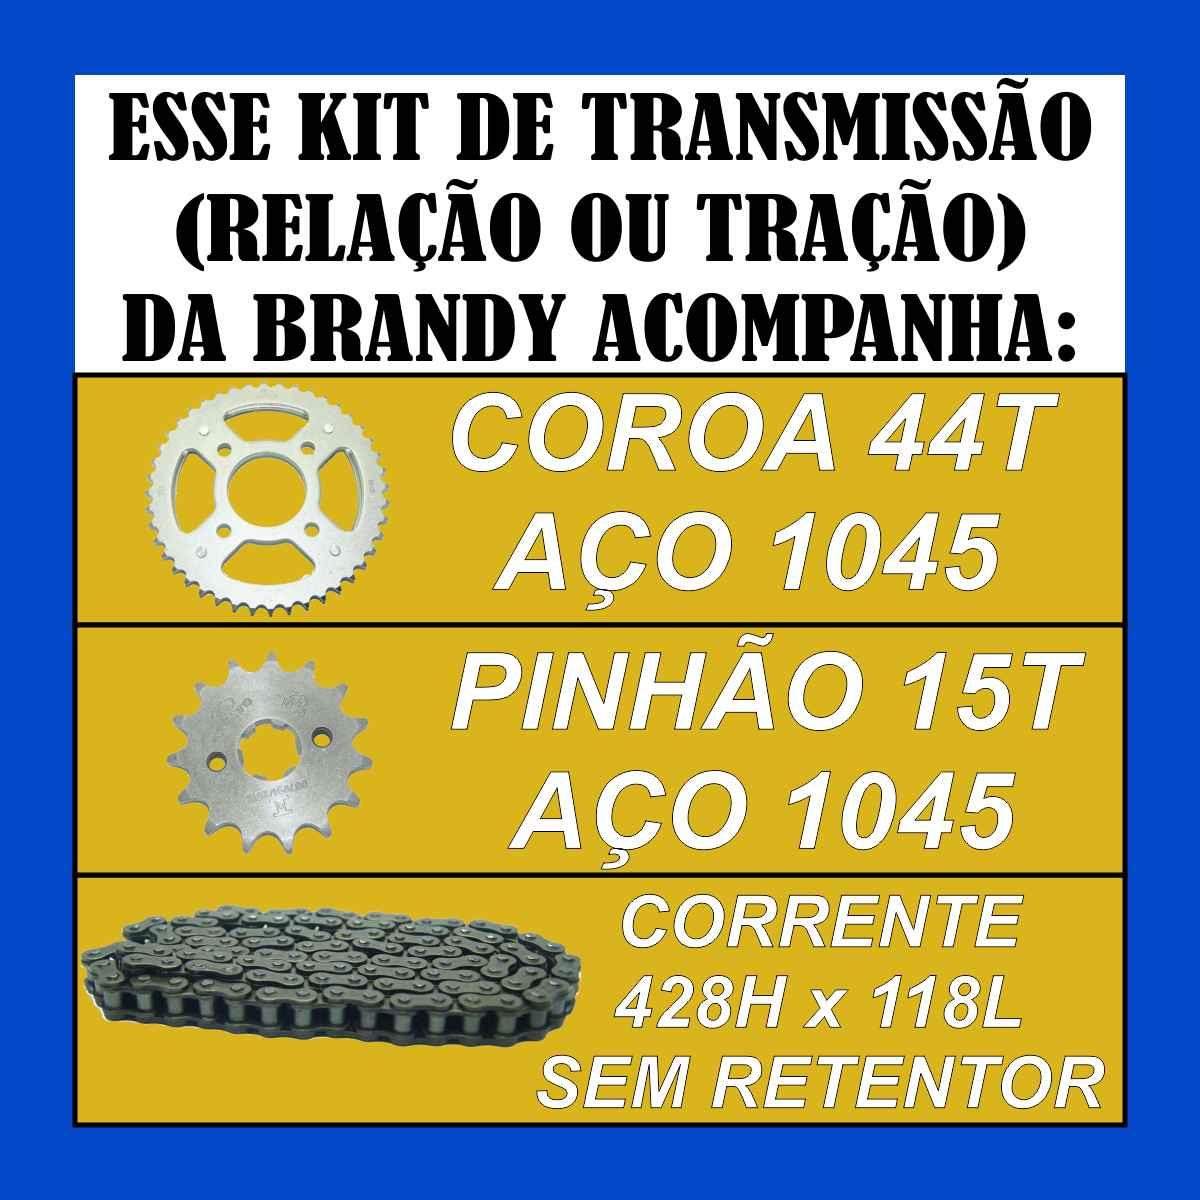 KIT TRANSMISSAO RELAÇÃO BRANDY CORRENTE 428H x 118L COROA 44T PINHÃO 15T PARA CG 160 TITAN / FAN 160